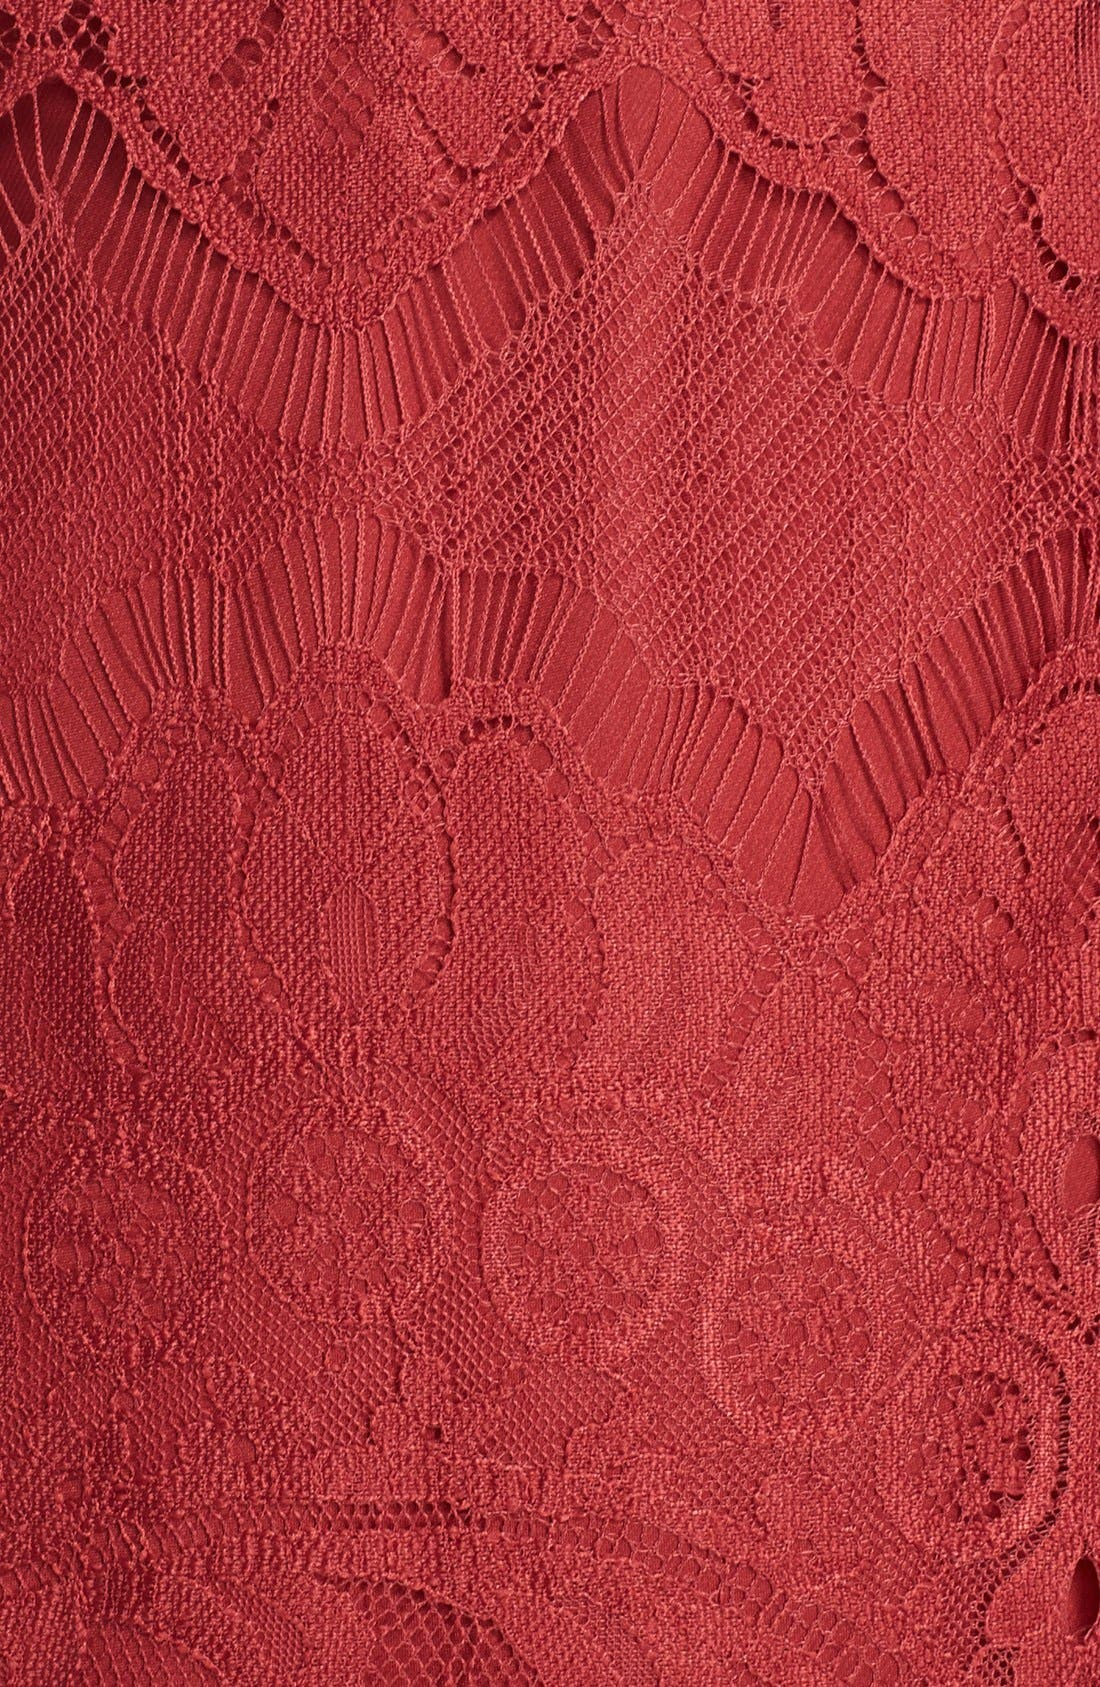 'Natalia' Lace Sheath Dress,                             Alternate thumbnail 5, color,                             Bordeaux